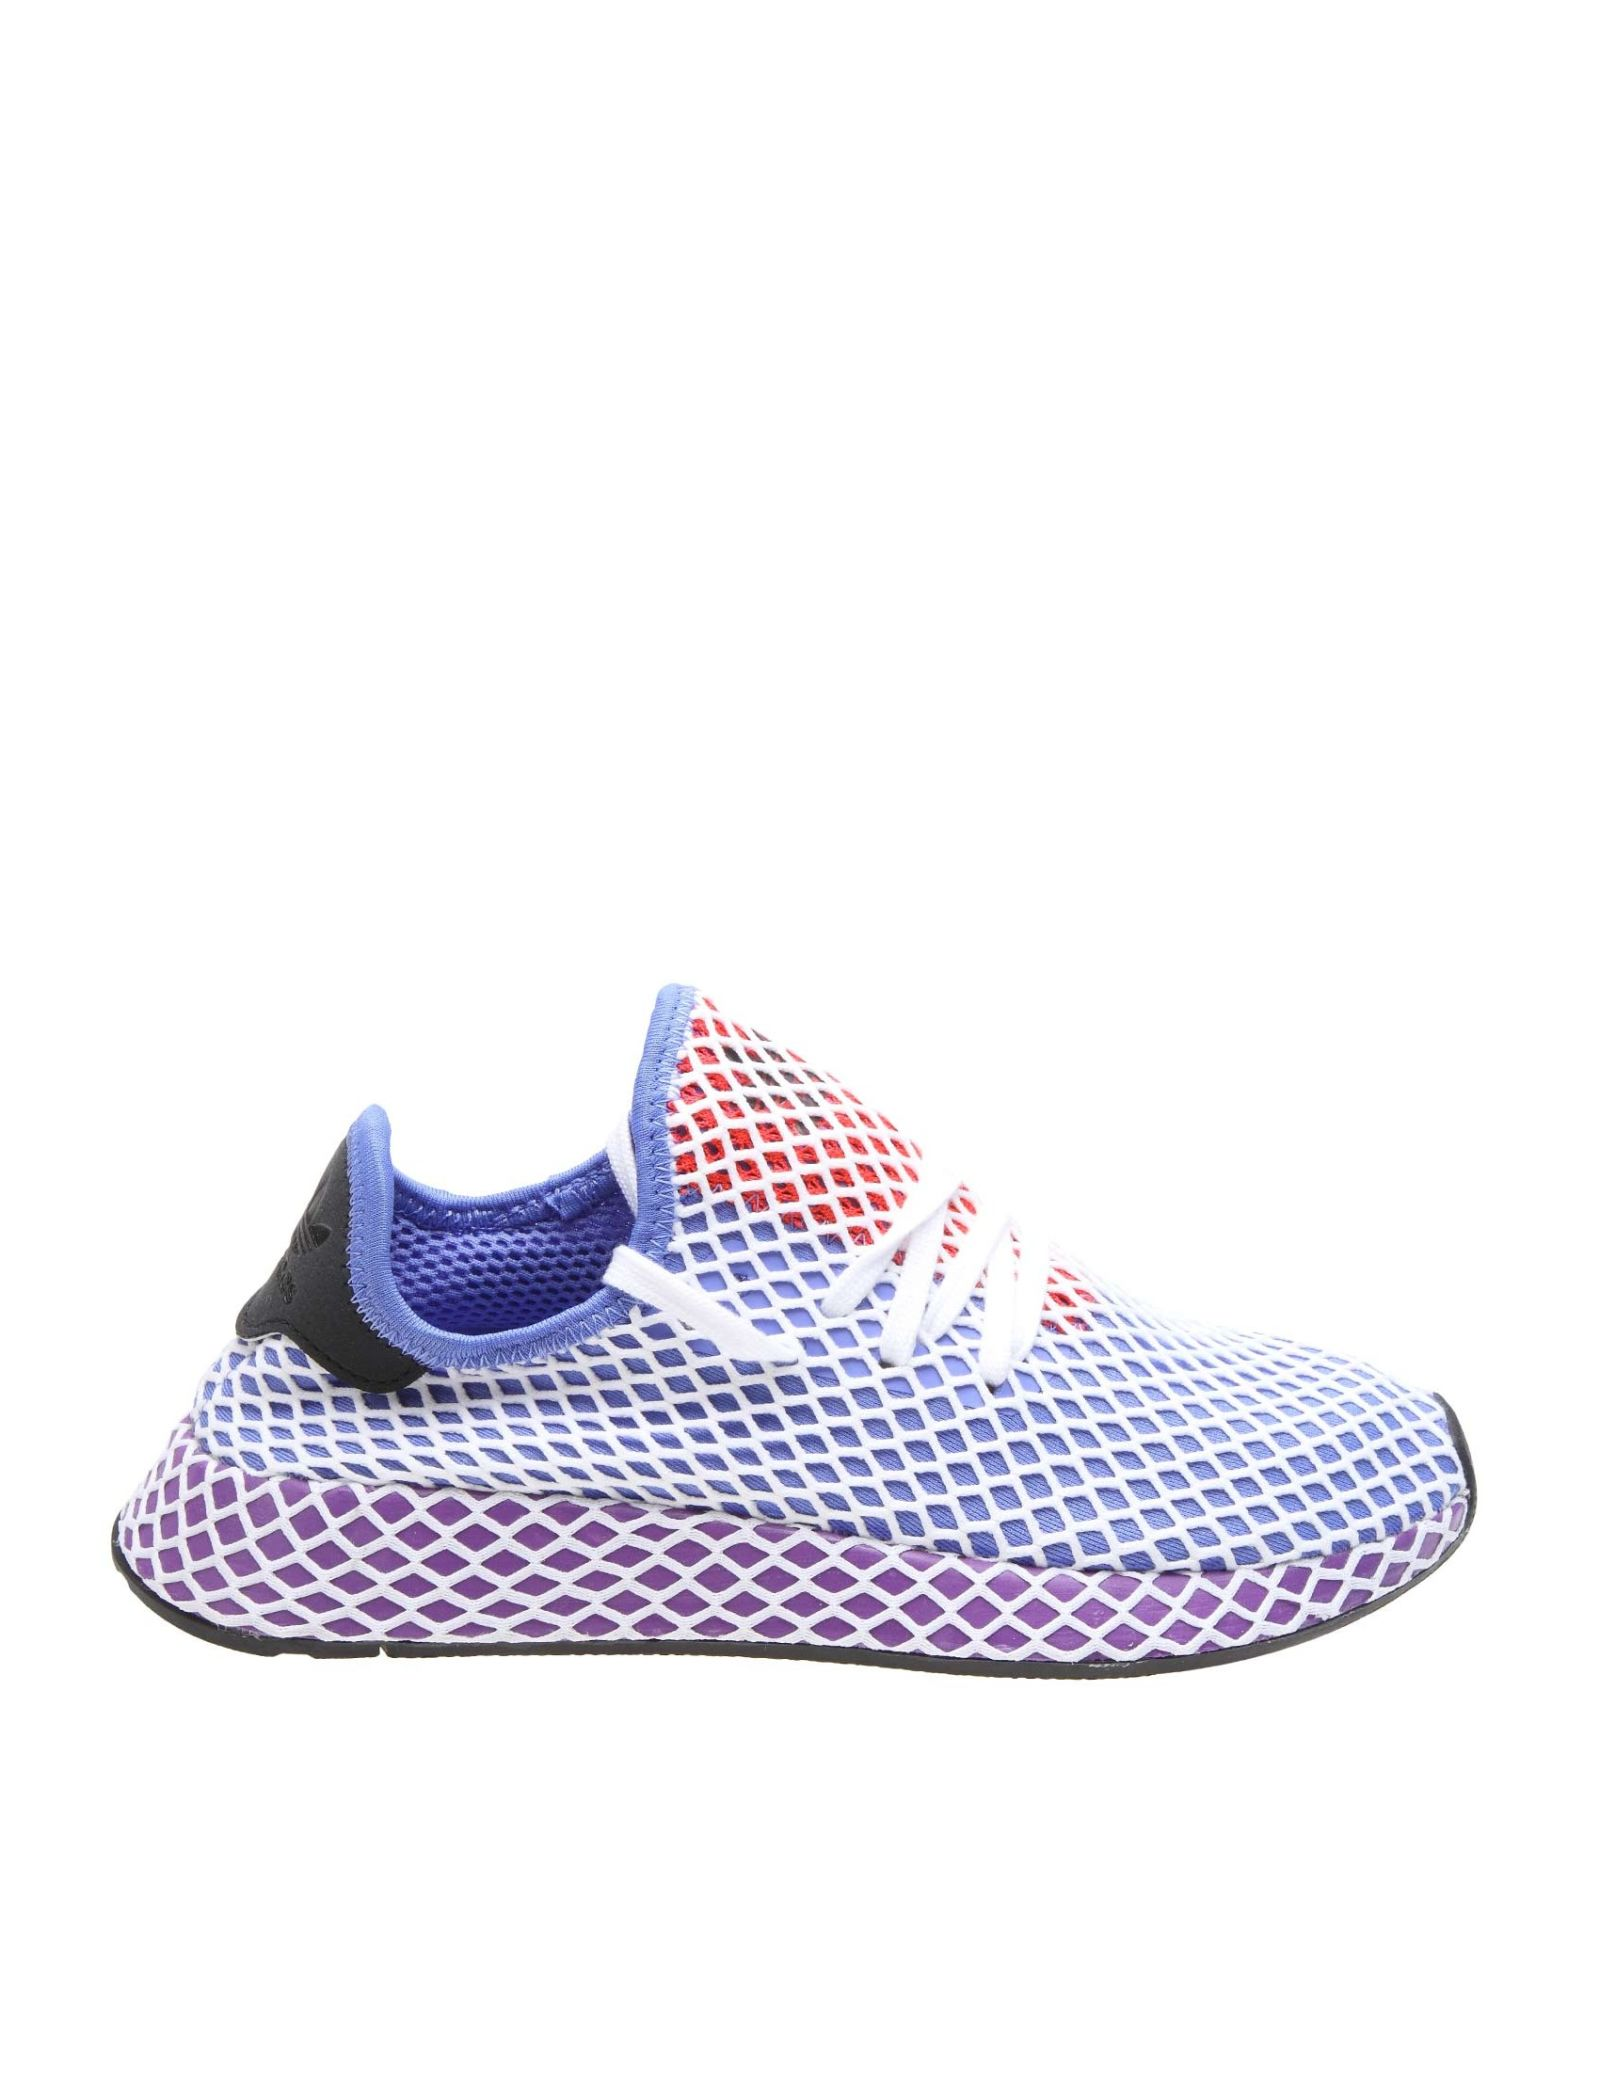 1d044a9d8c785 Adidas Originals Sneakers Deerupt Runner In Mesh With A Network Motif -  Lilac ...